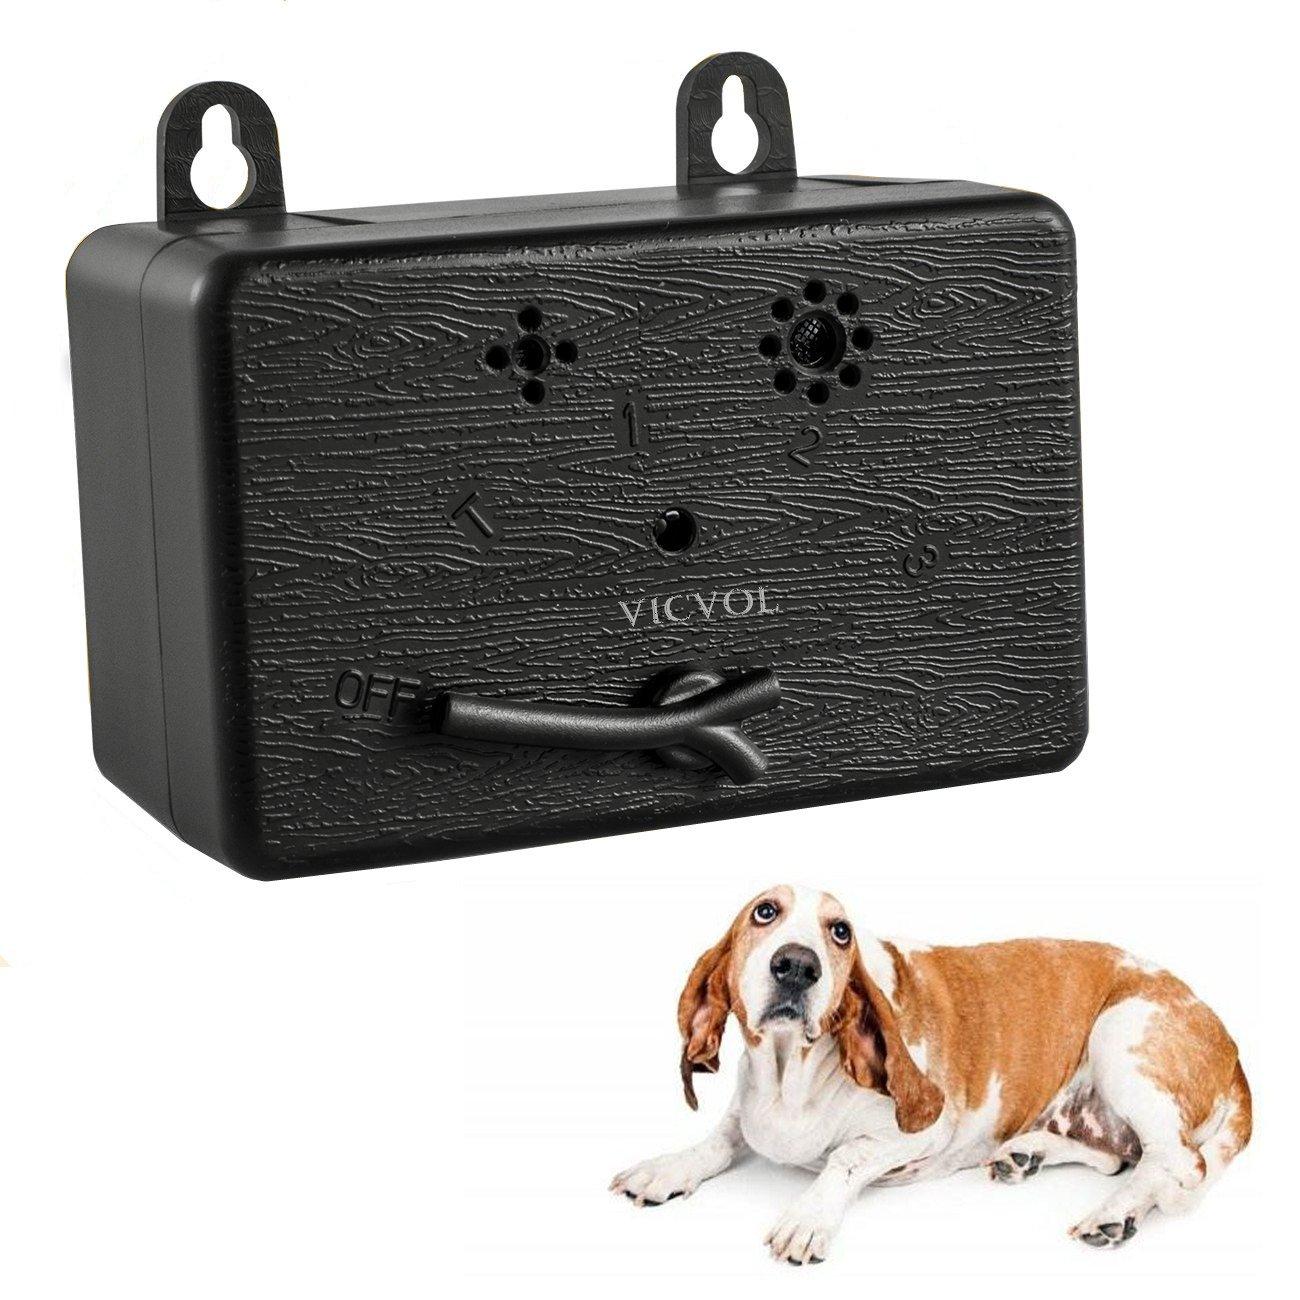 Vicvol Mini Bark Control Device, Outdoor Anti Barking Ultrasonic Dog Bark Control Sonic Bark Deterrents Silencer Stop Barking Bark Stop Repeller, No Bark Tool (A)